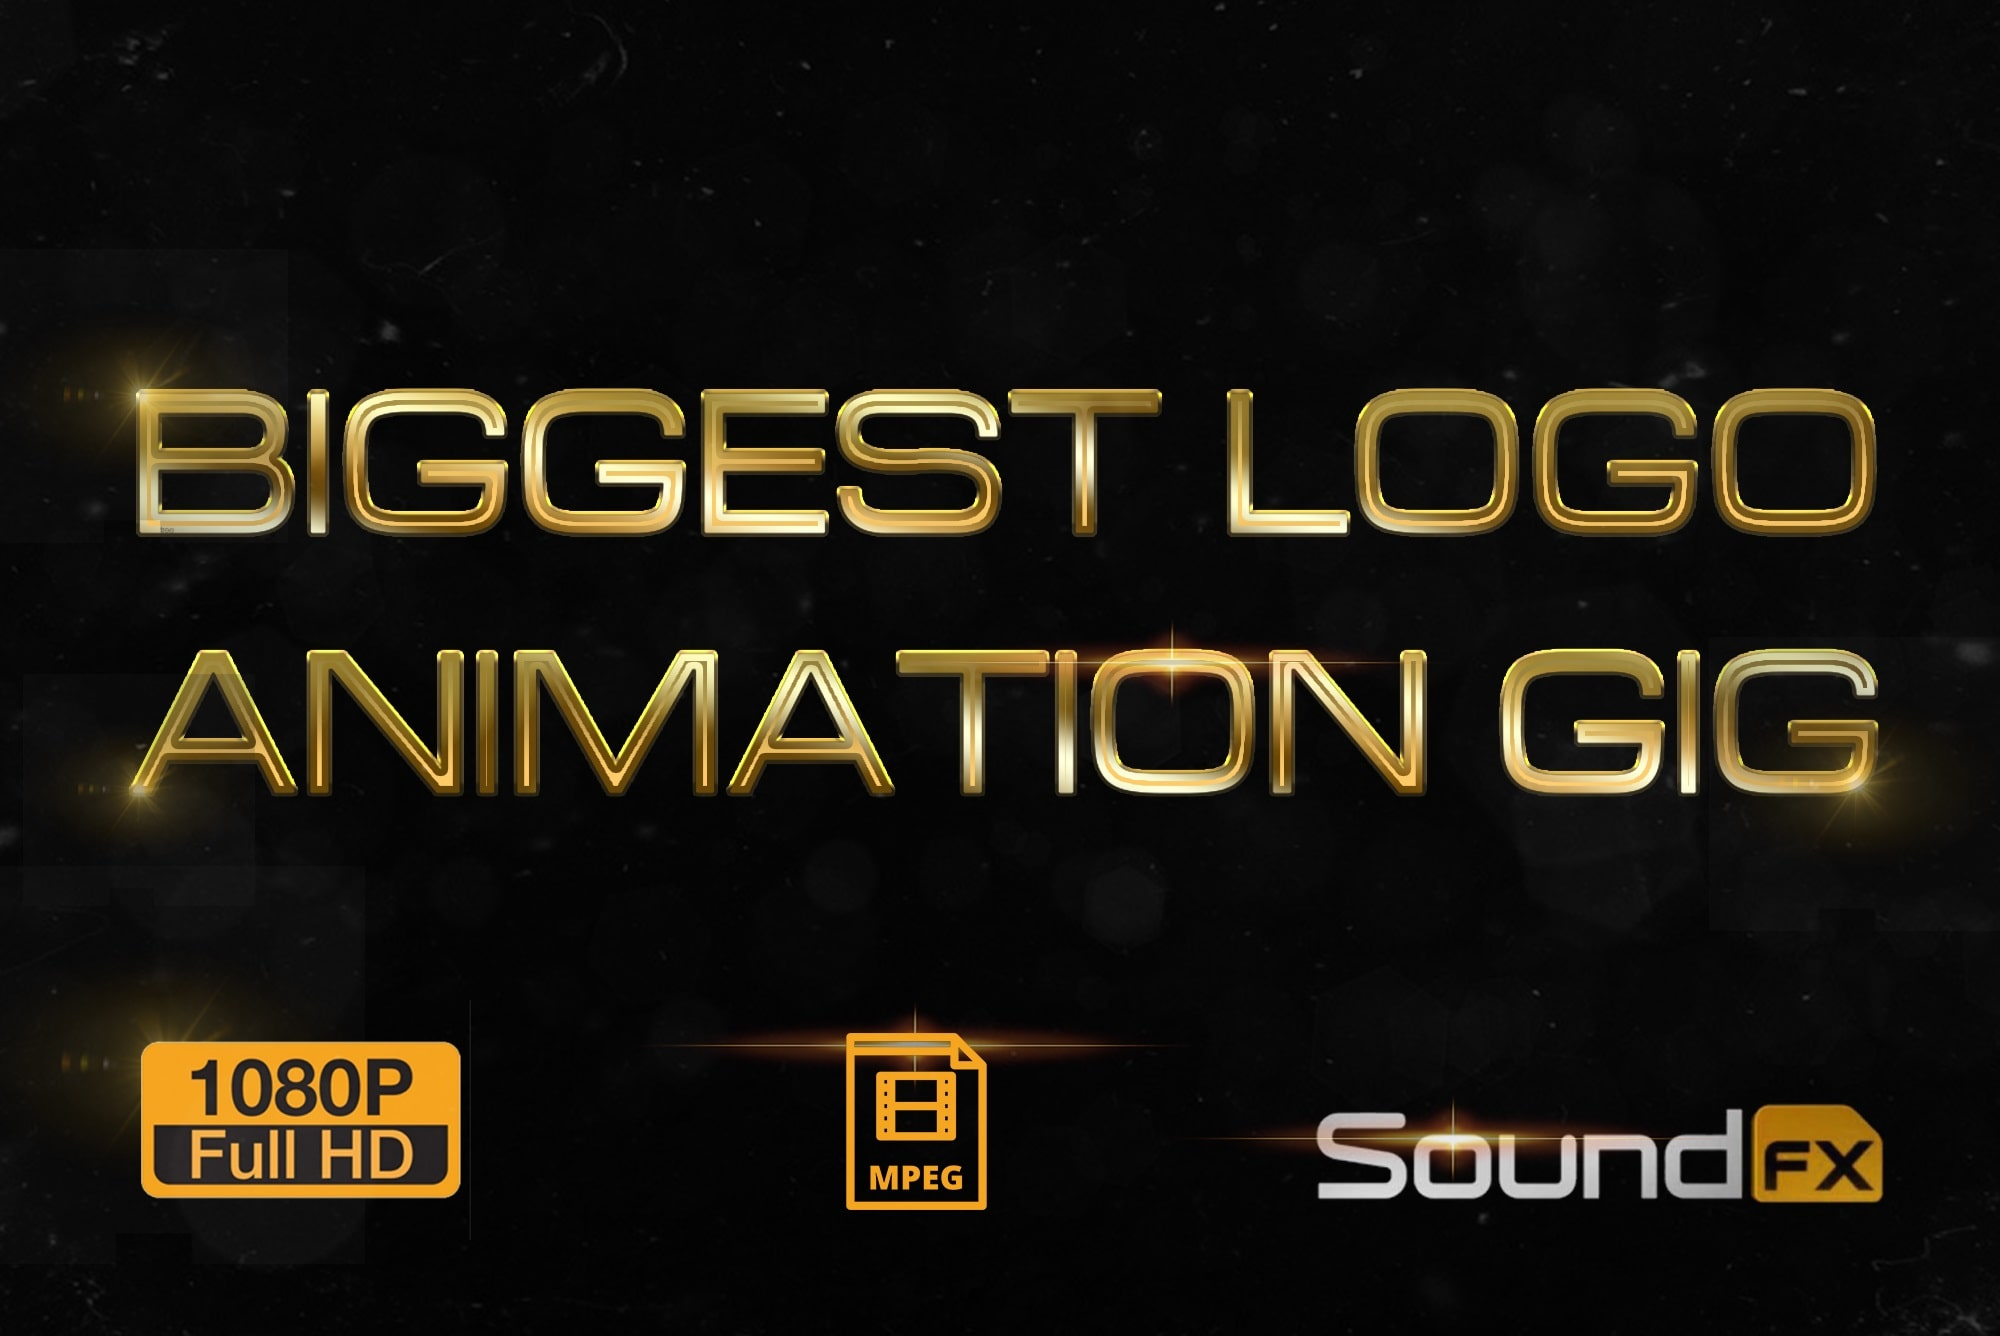 I will create 5 eye catching animated logo intro videos.